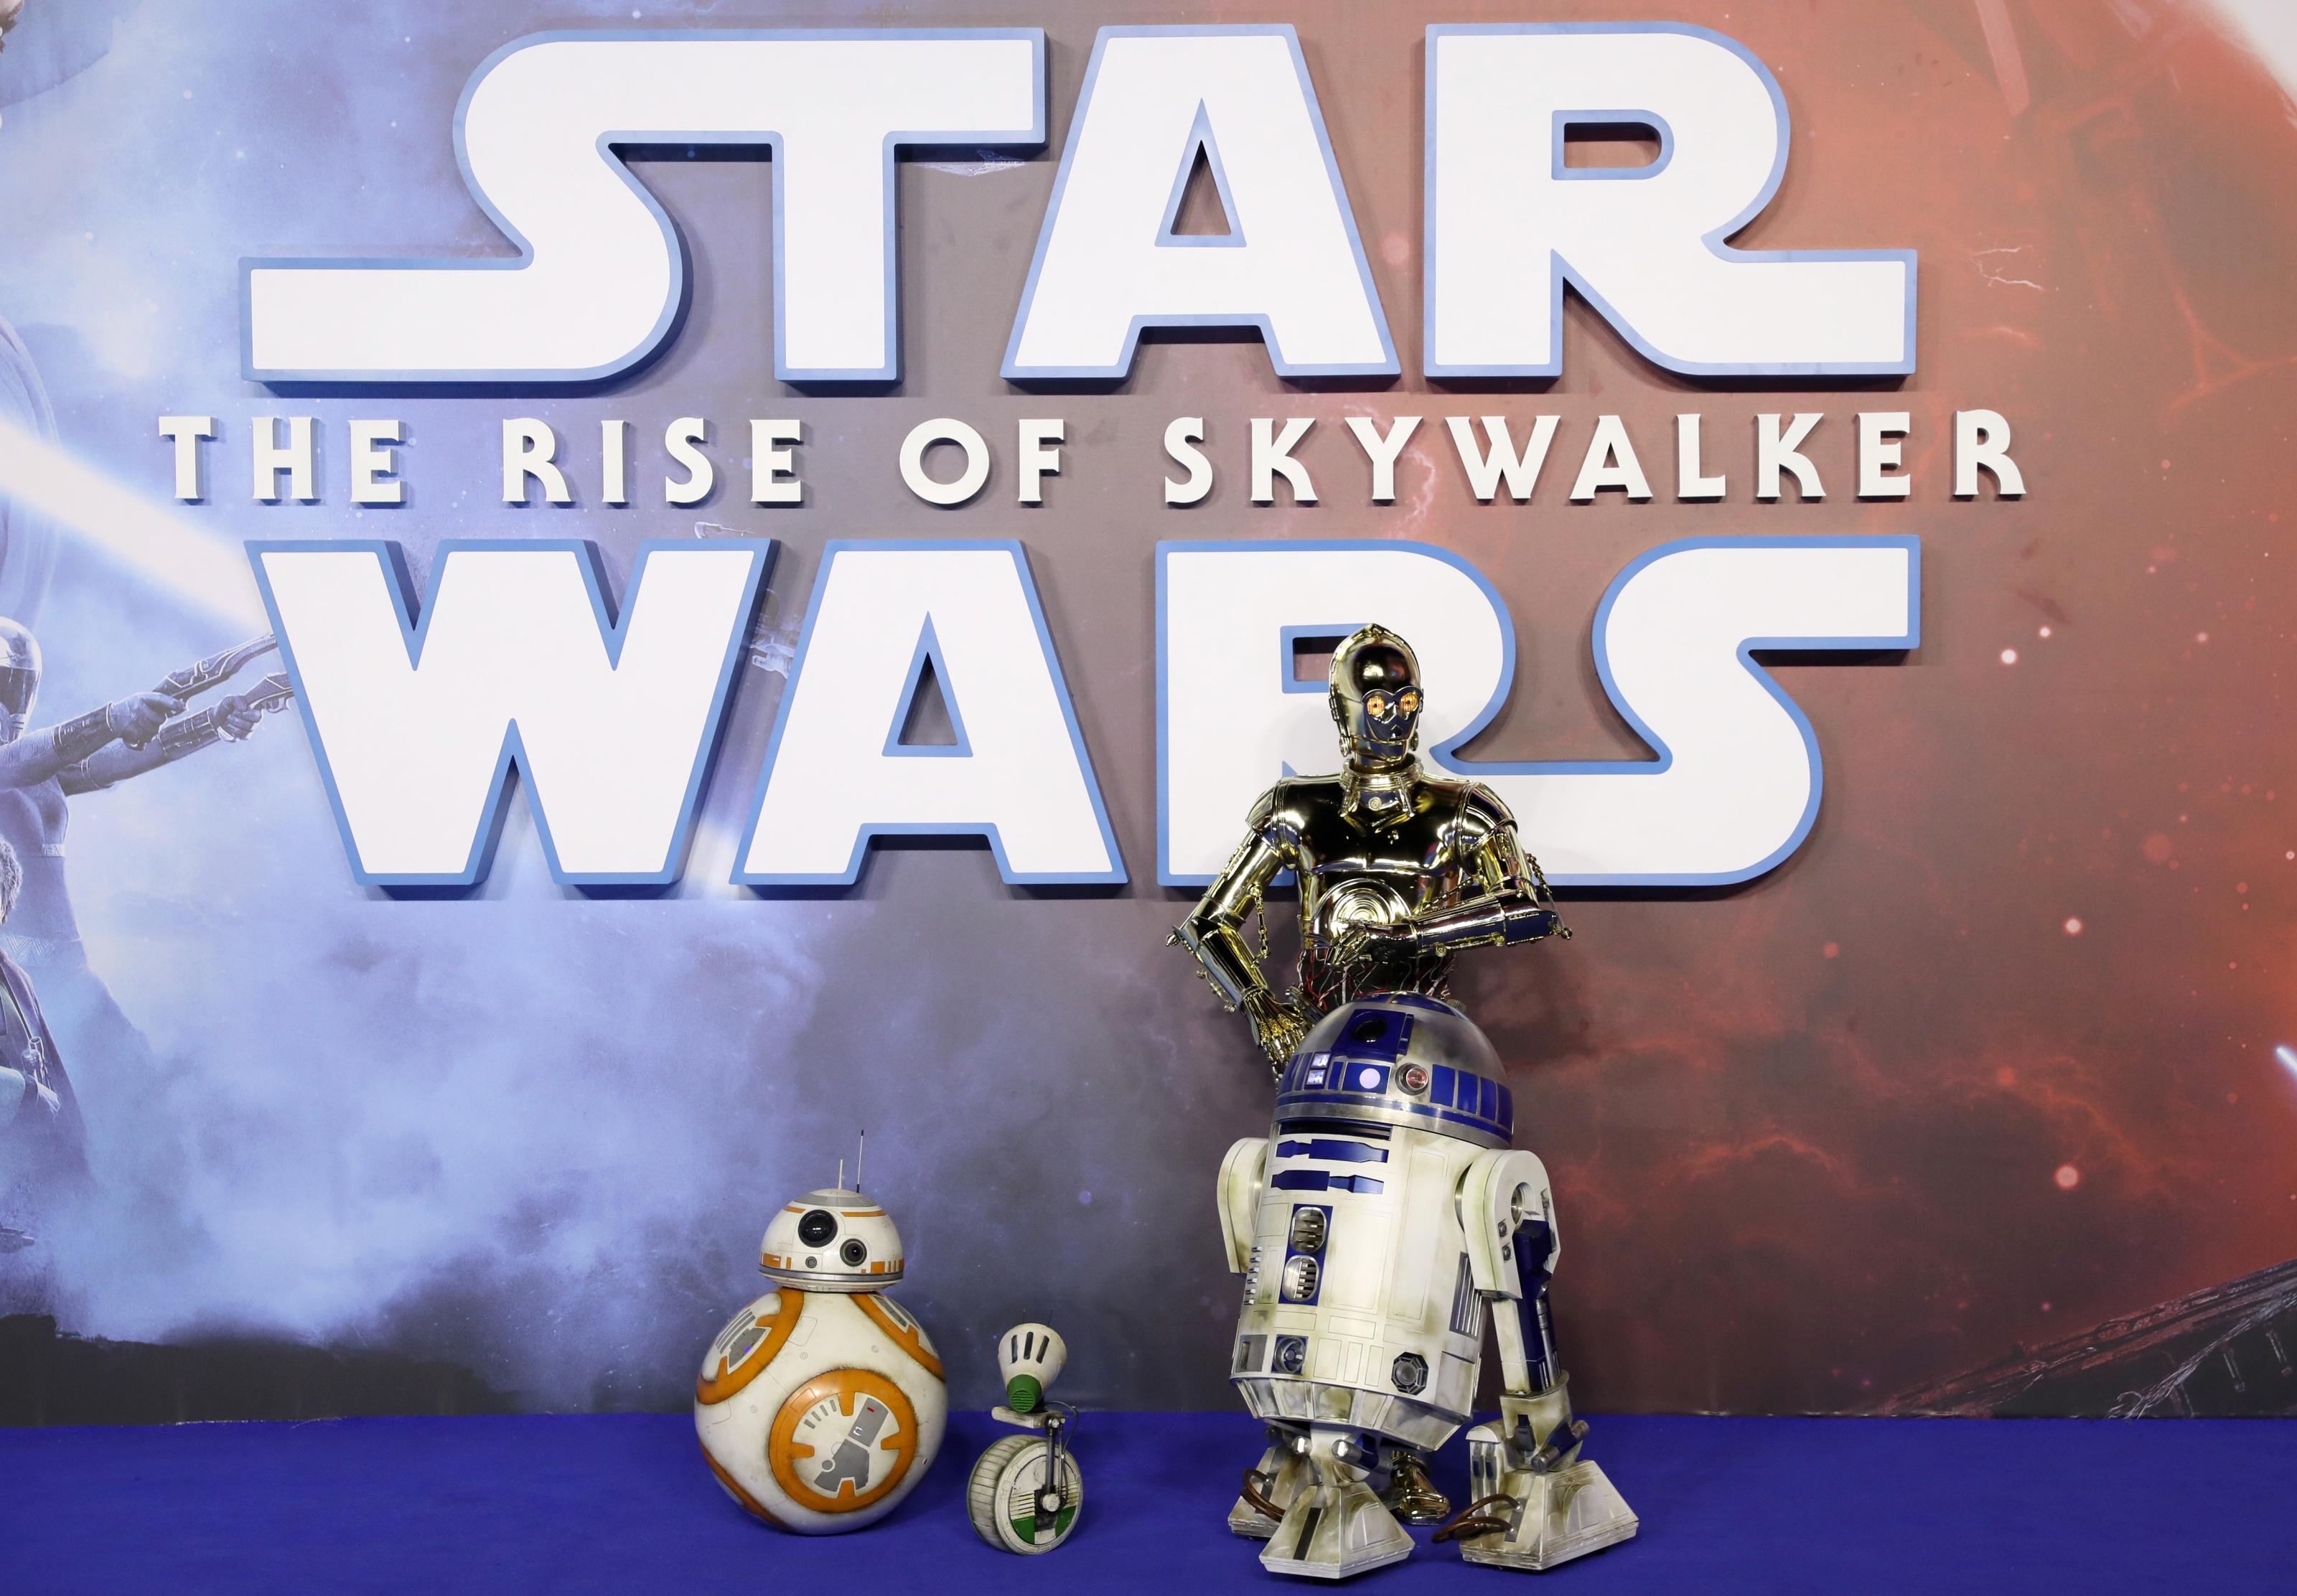 Star Wars Nerd cover image